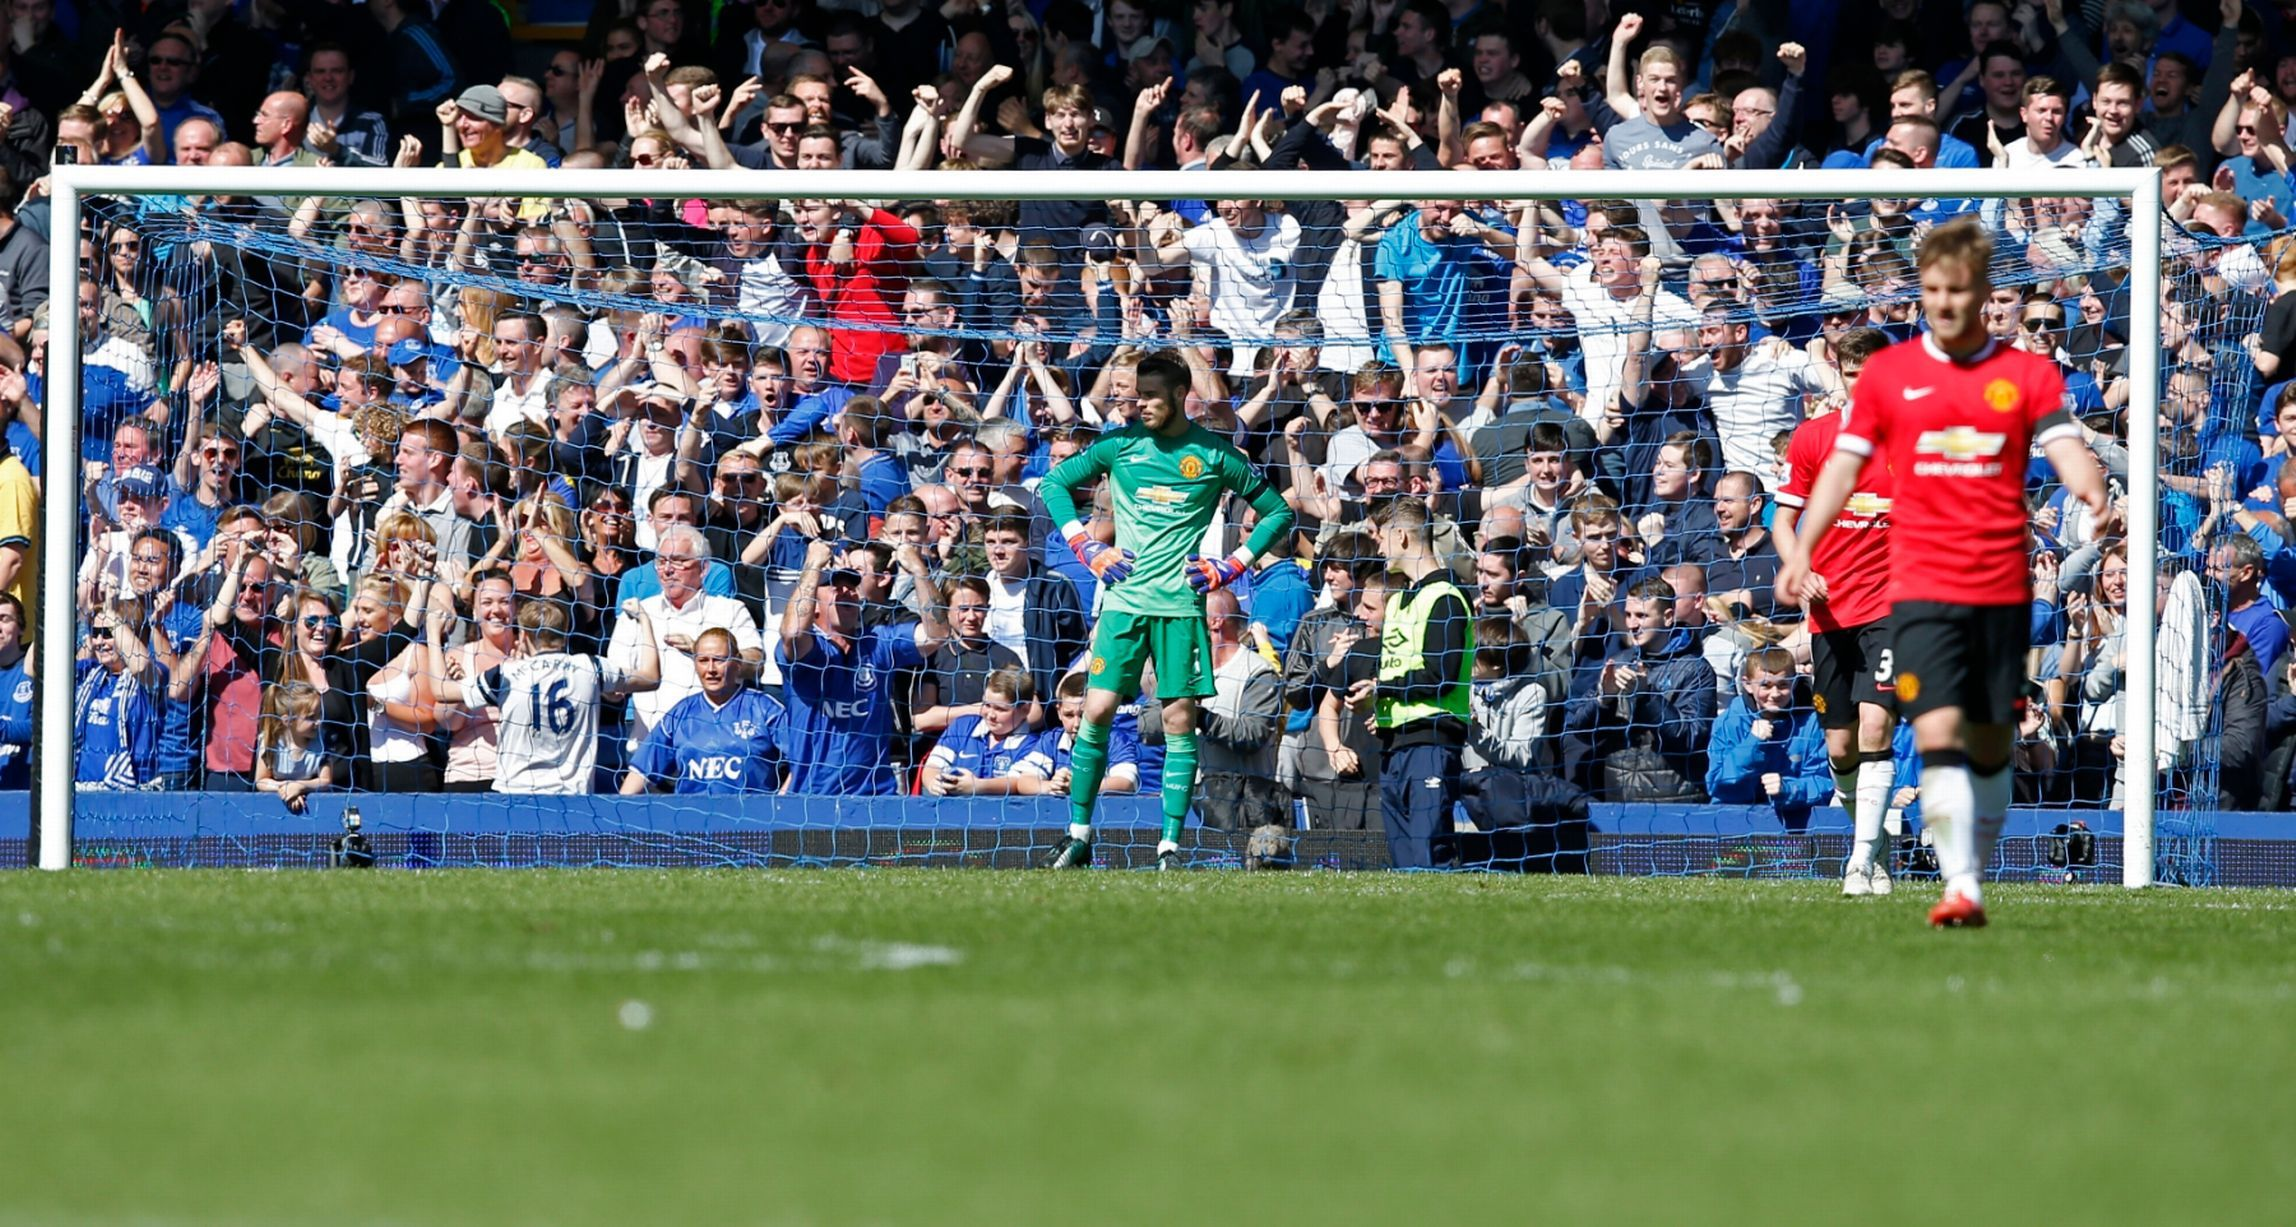 David De Gea looks dejected after Kevin Mirallas scores the third goal